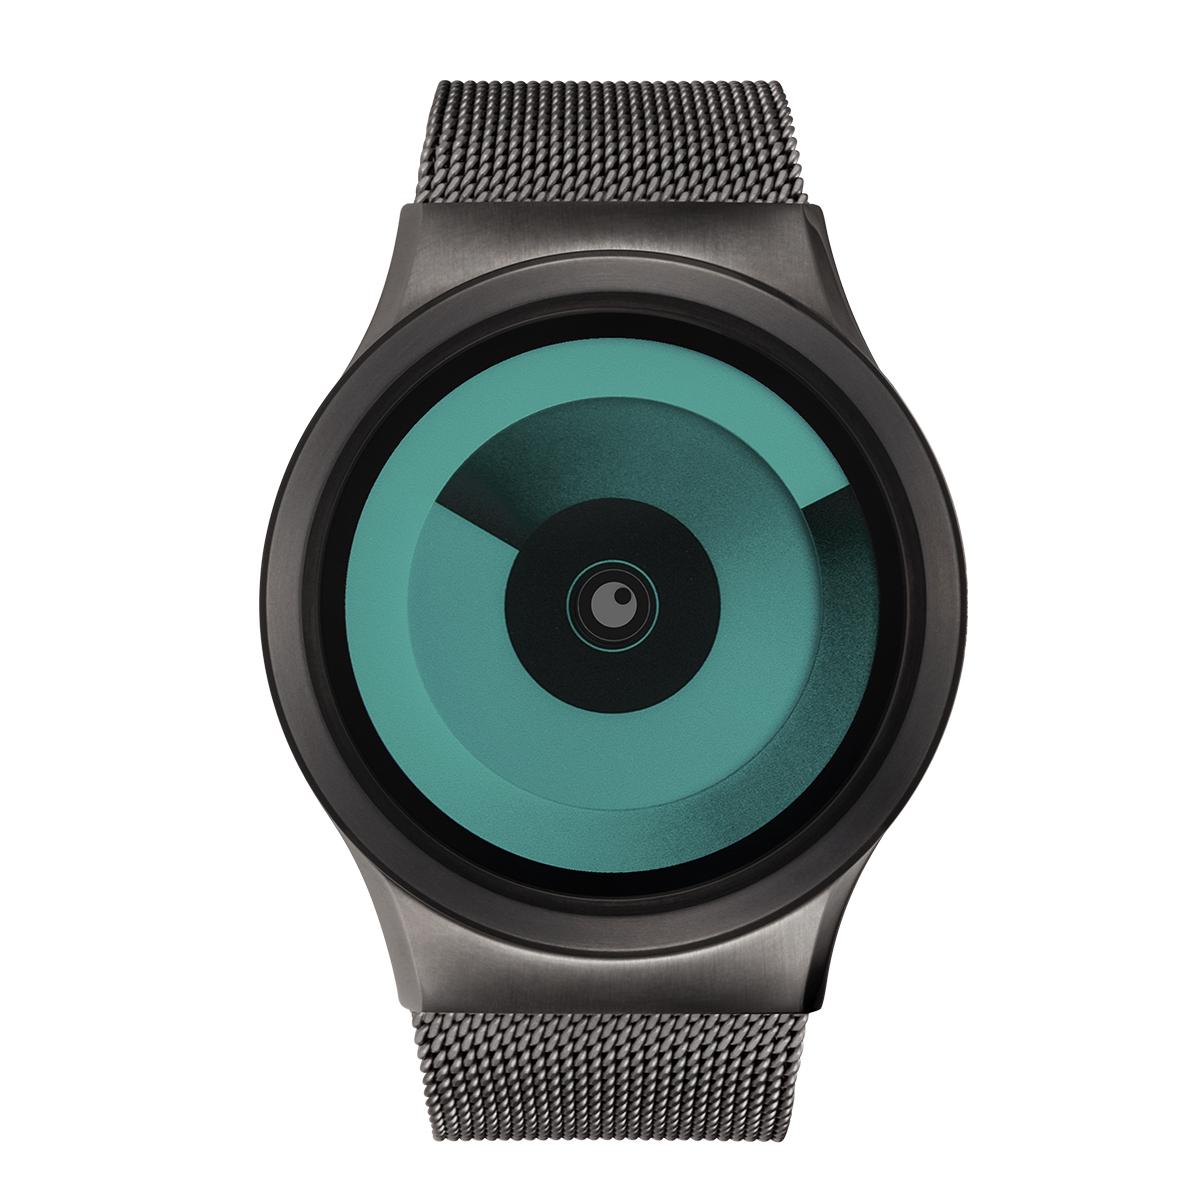 ZEROO SPIRAL GALAXY ゼロ 電池式クォーツ 腕時計 [W06018B02SM02] グリーン デザインウォッチ ペア用 メンズ レディース ユニセックス おしゃれ時計 デザイナーズ